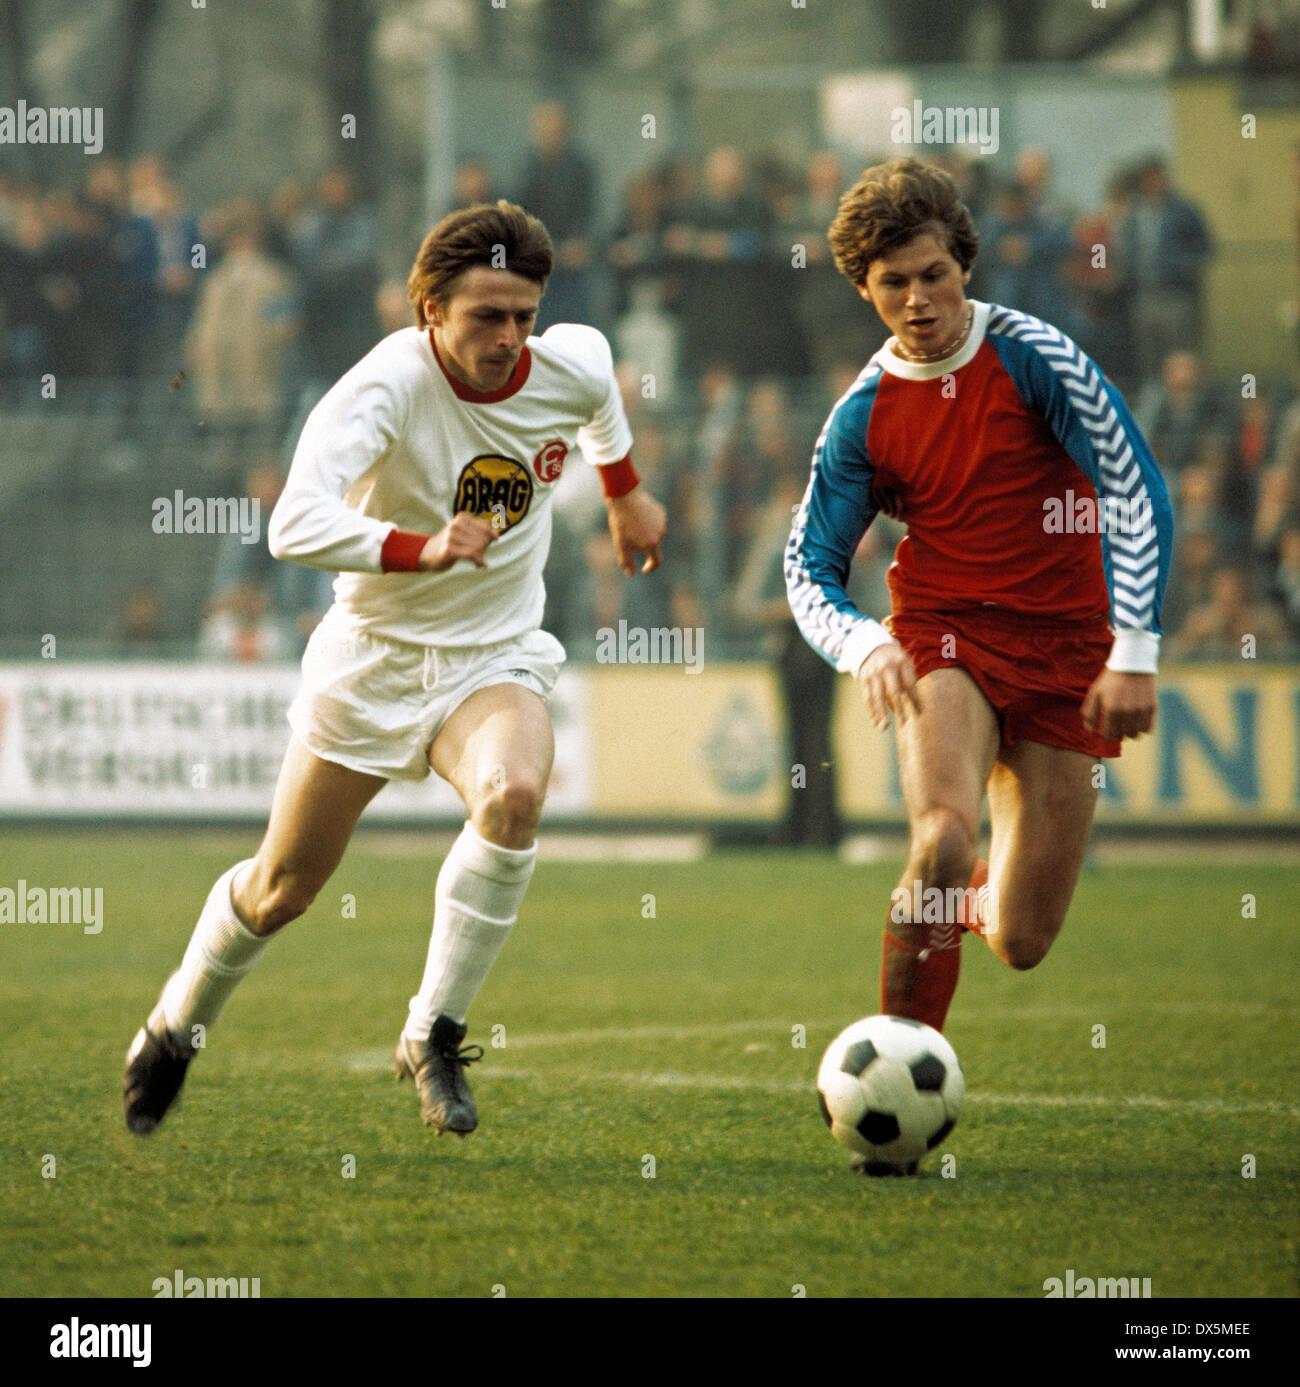 football, Bundesliga, 1975/1976, Grotenburg Stadium, FC Bayer 05 Uerdingen versus Fortuna Duesseldorf 2:0,scene of the match, duel, Klaus Allofs (Fortuna) left and Uwe Hansel (05) - Stock Image